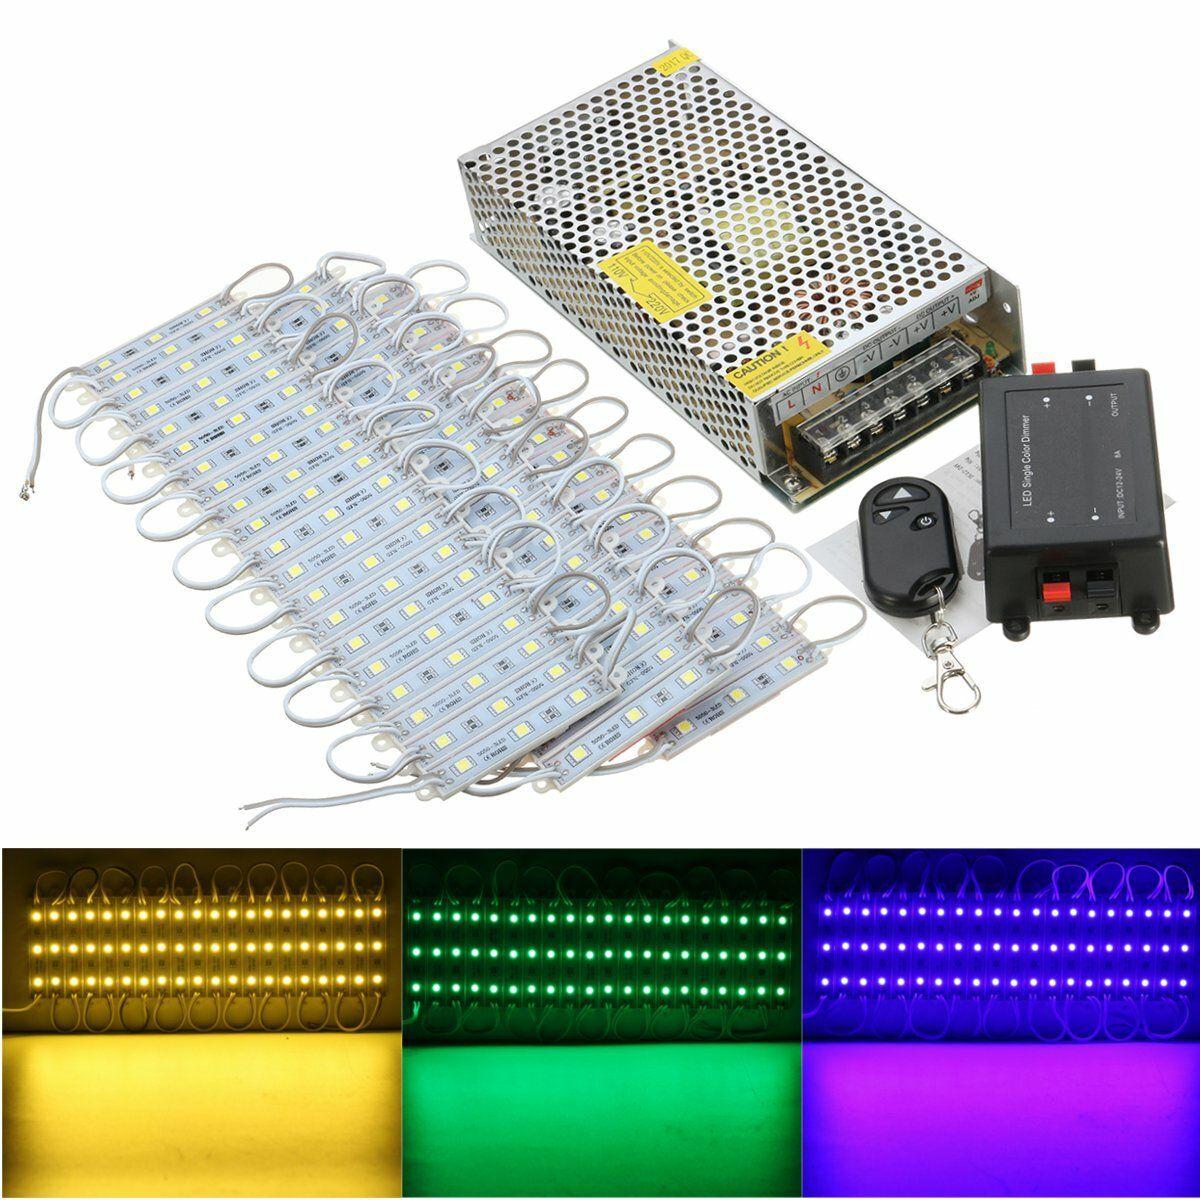 ZML US$38.12 60PCS 5 Colors SMD5050 LED Module Store Strip Light Front Window Lamp + Power Supply + Remote DC12V